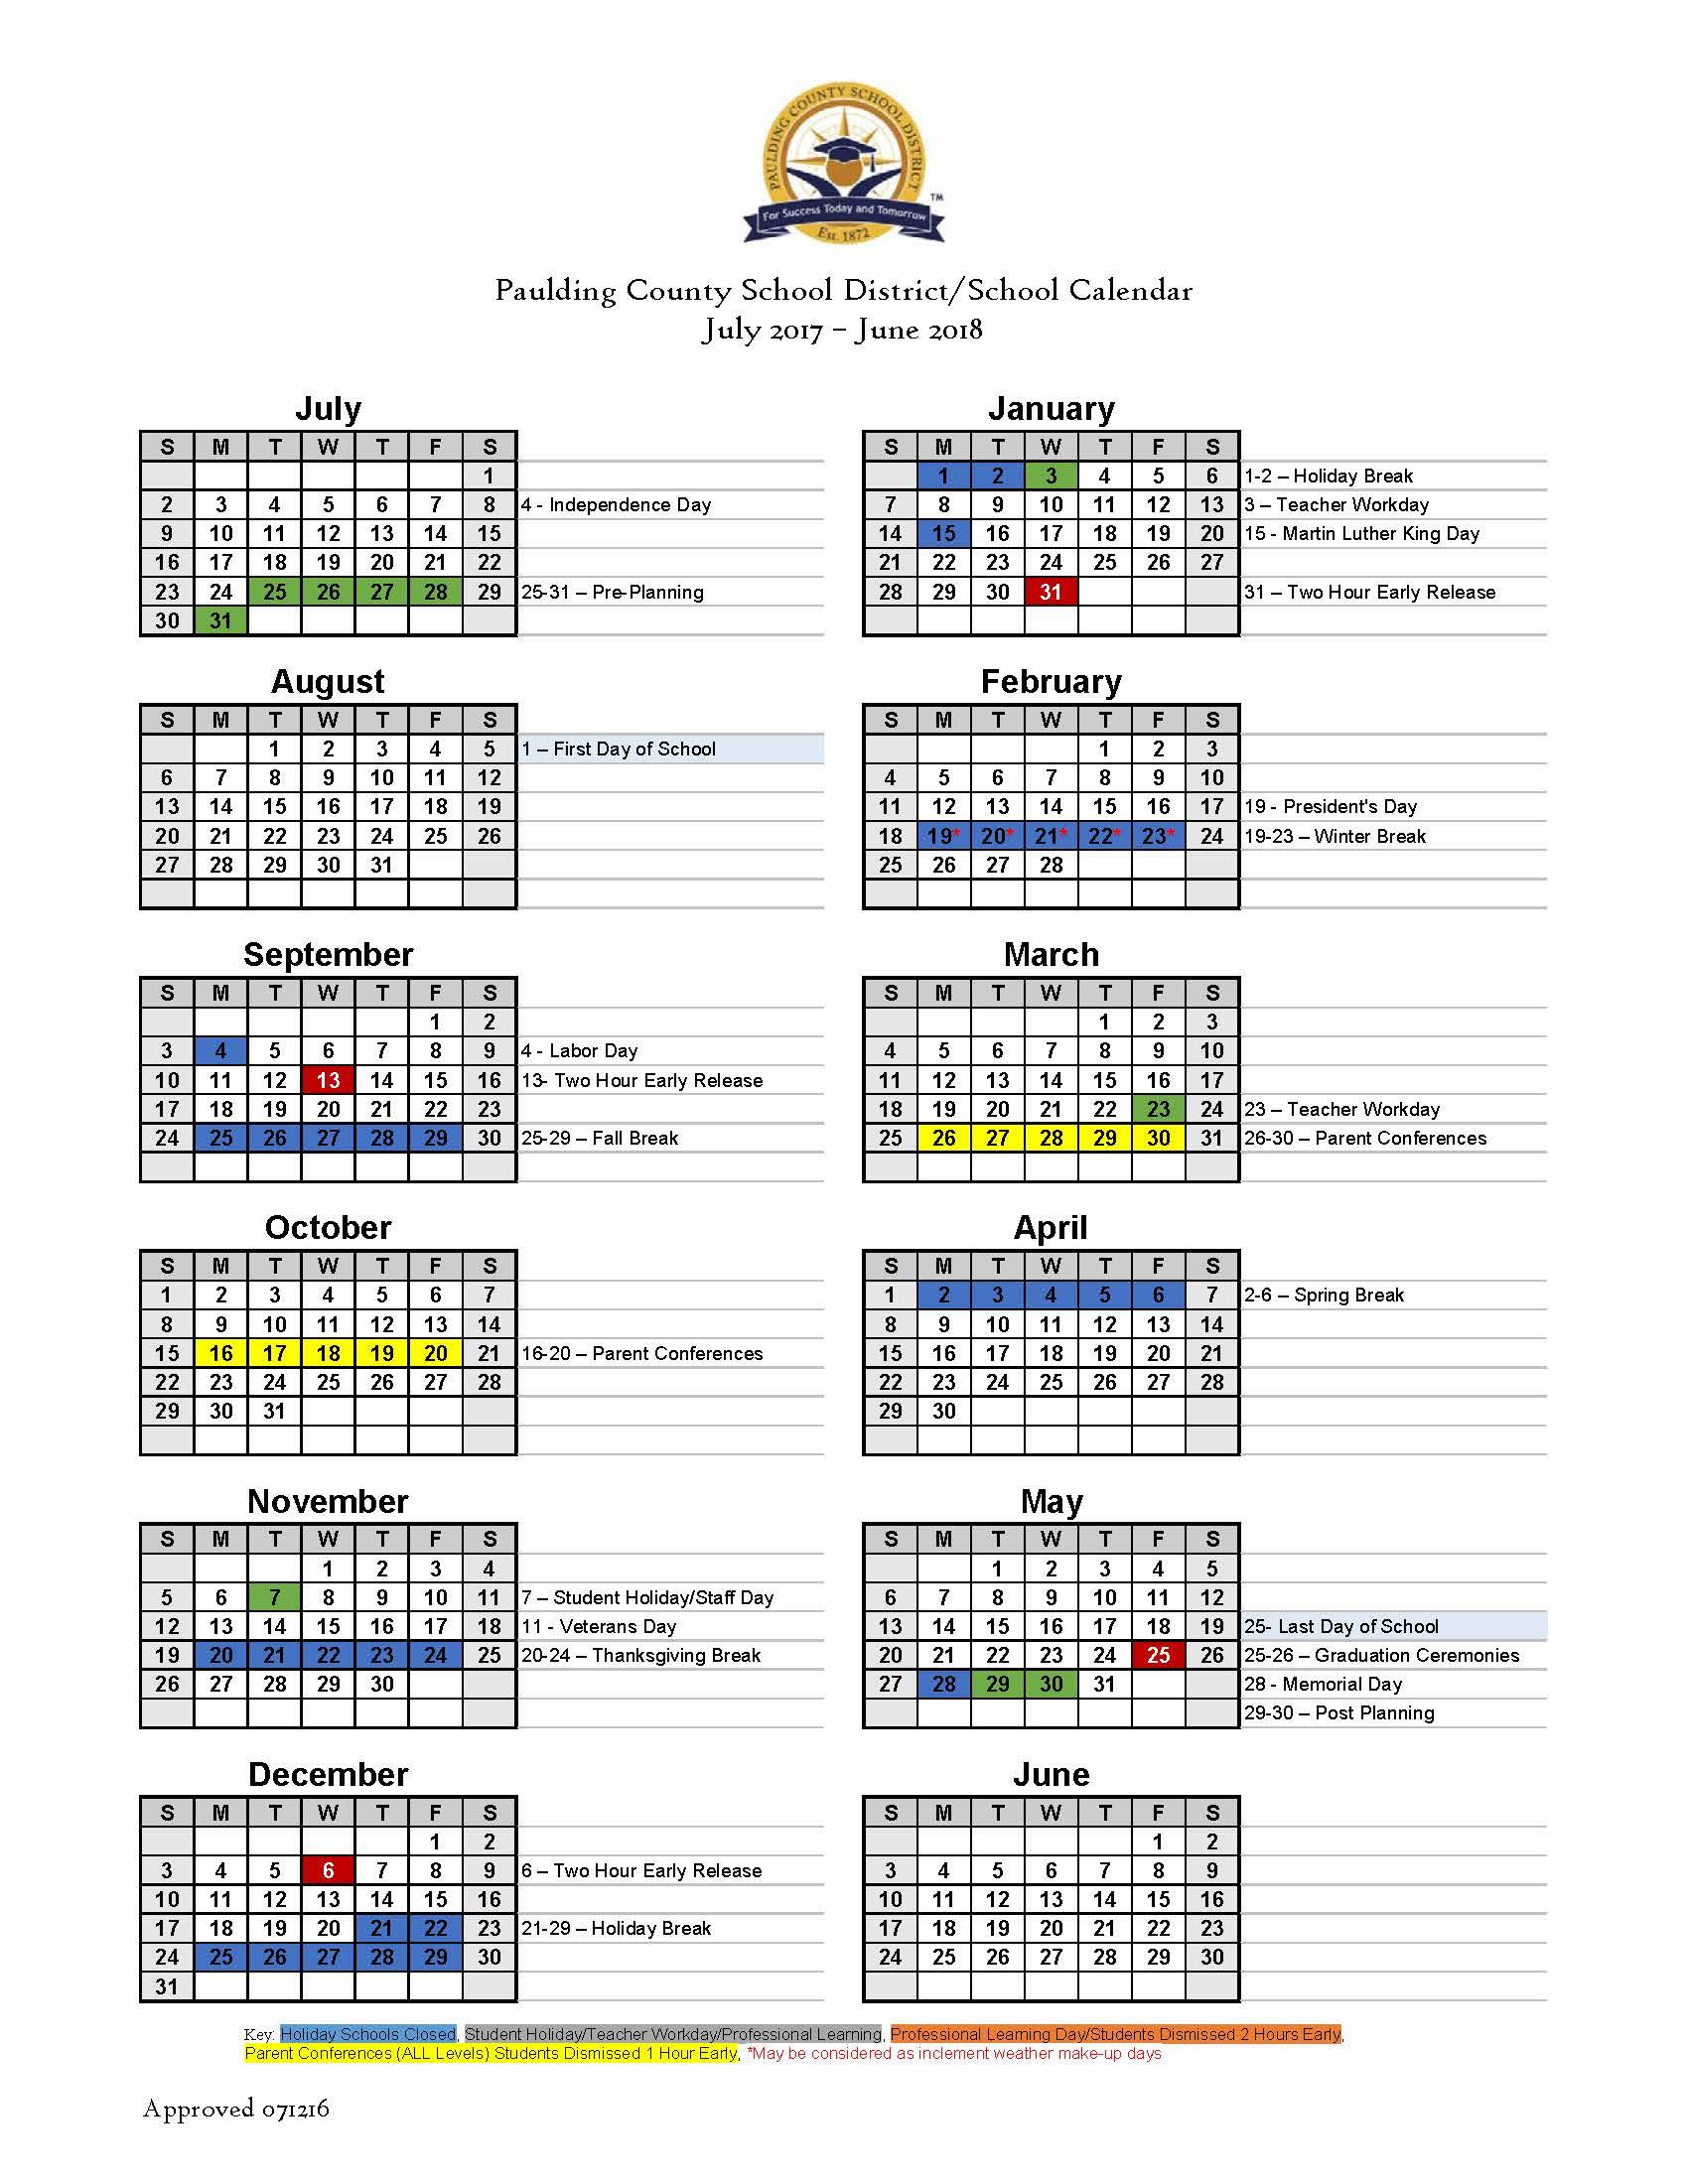 Paulding County School Calendar Back To School 2017 in Cobb & Paulding Counties